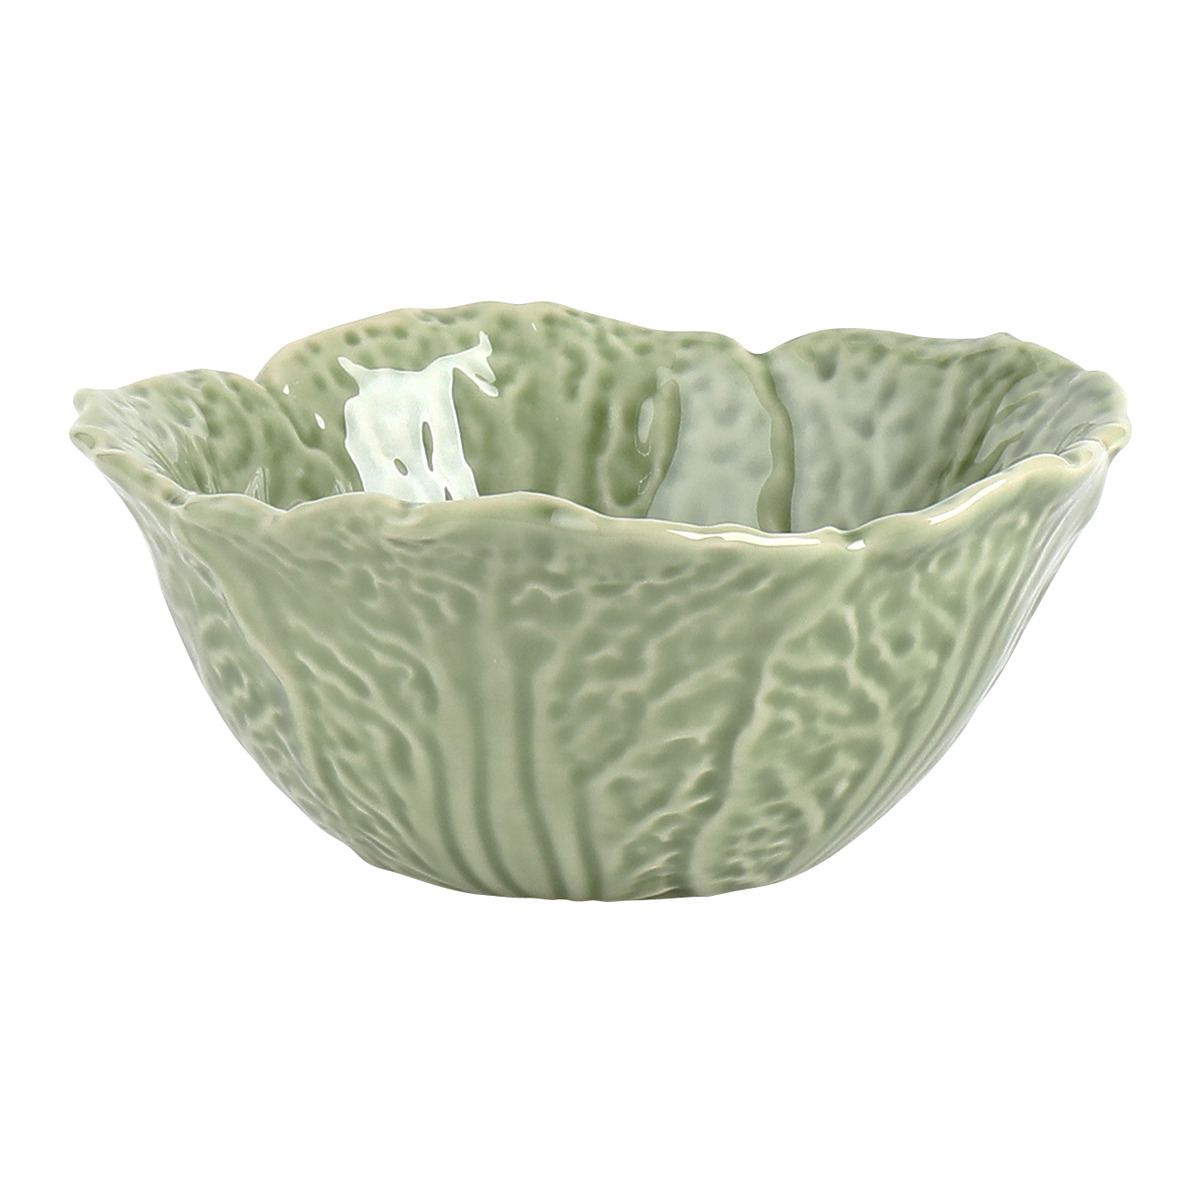 Bowl lechuga Caoba